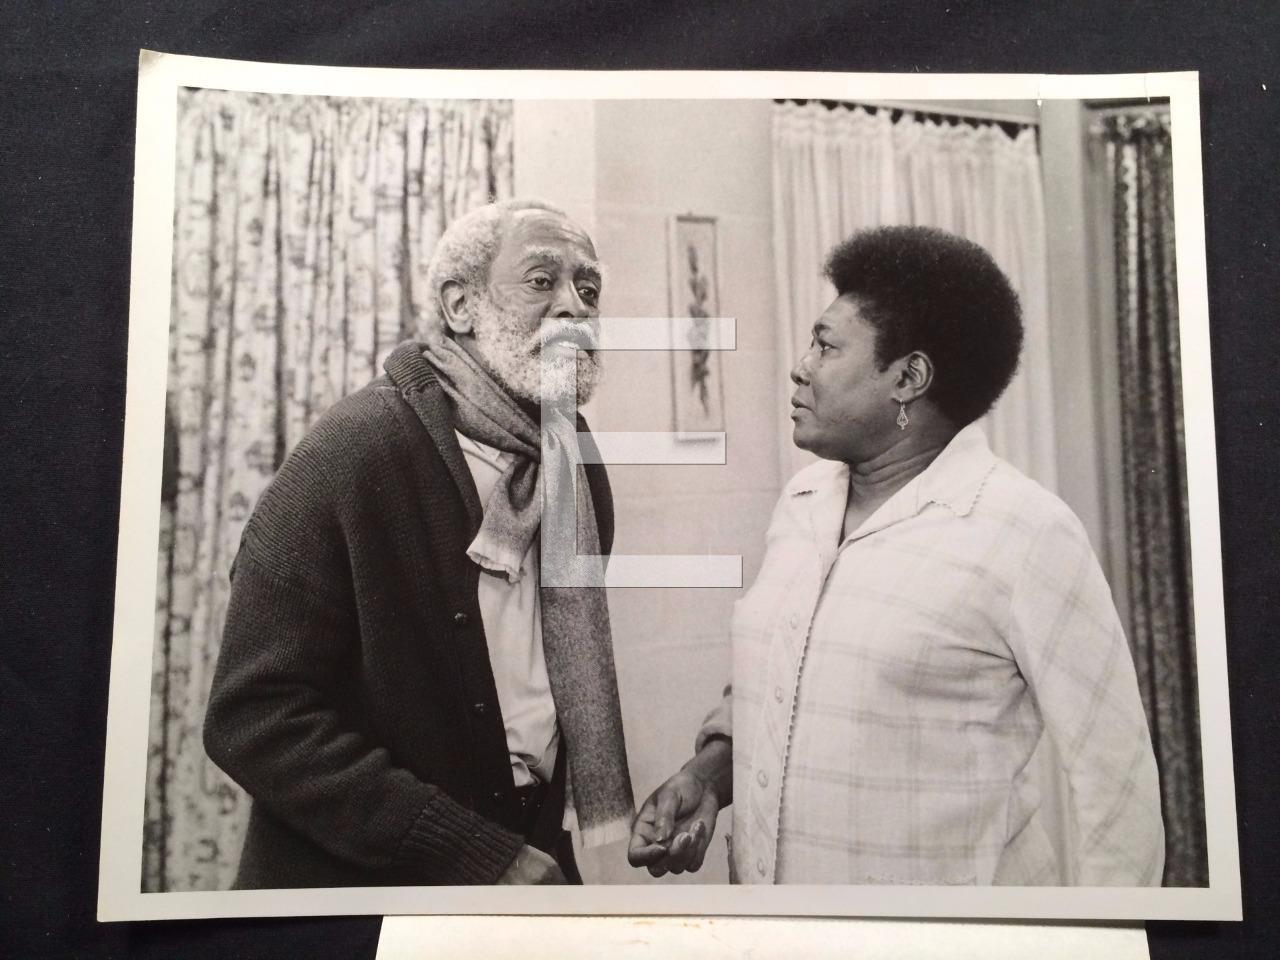 1976_GOOD_TIMES_Esther_Rolle_Arnold_Johnson_Vintage_Original_TV_Still_Photo_A84